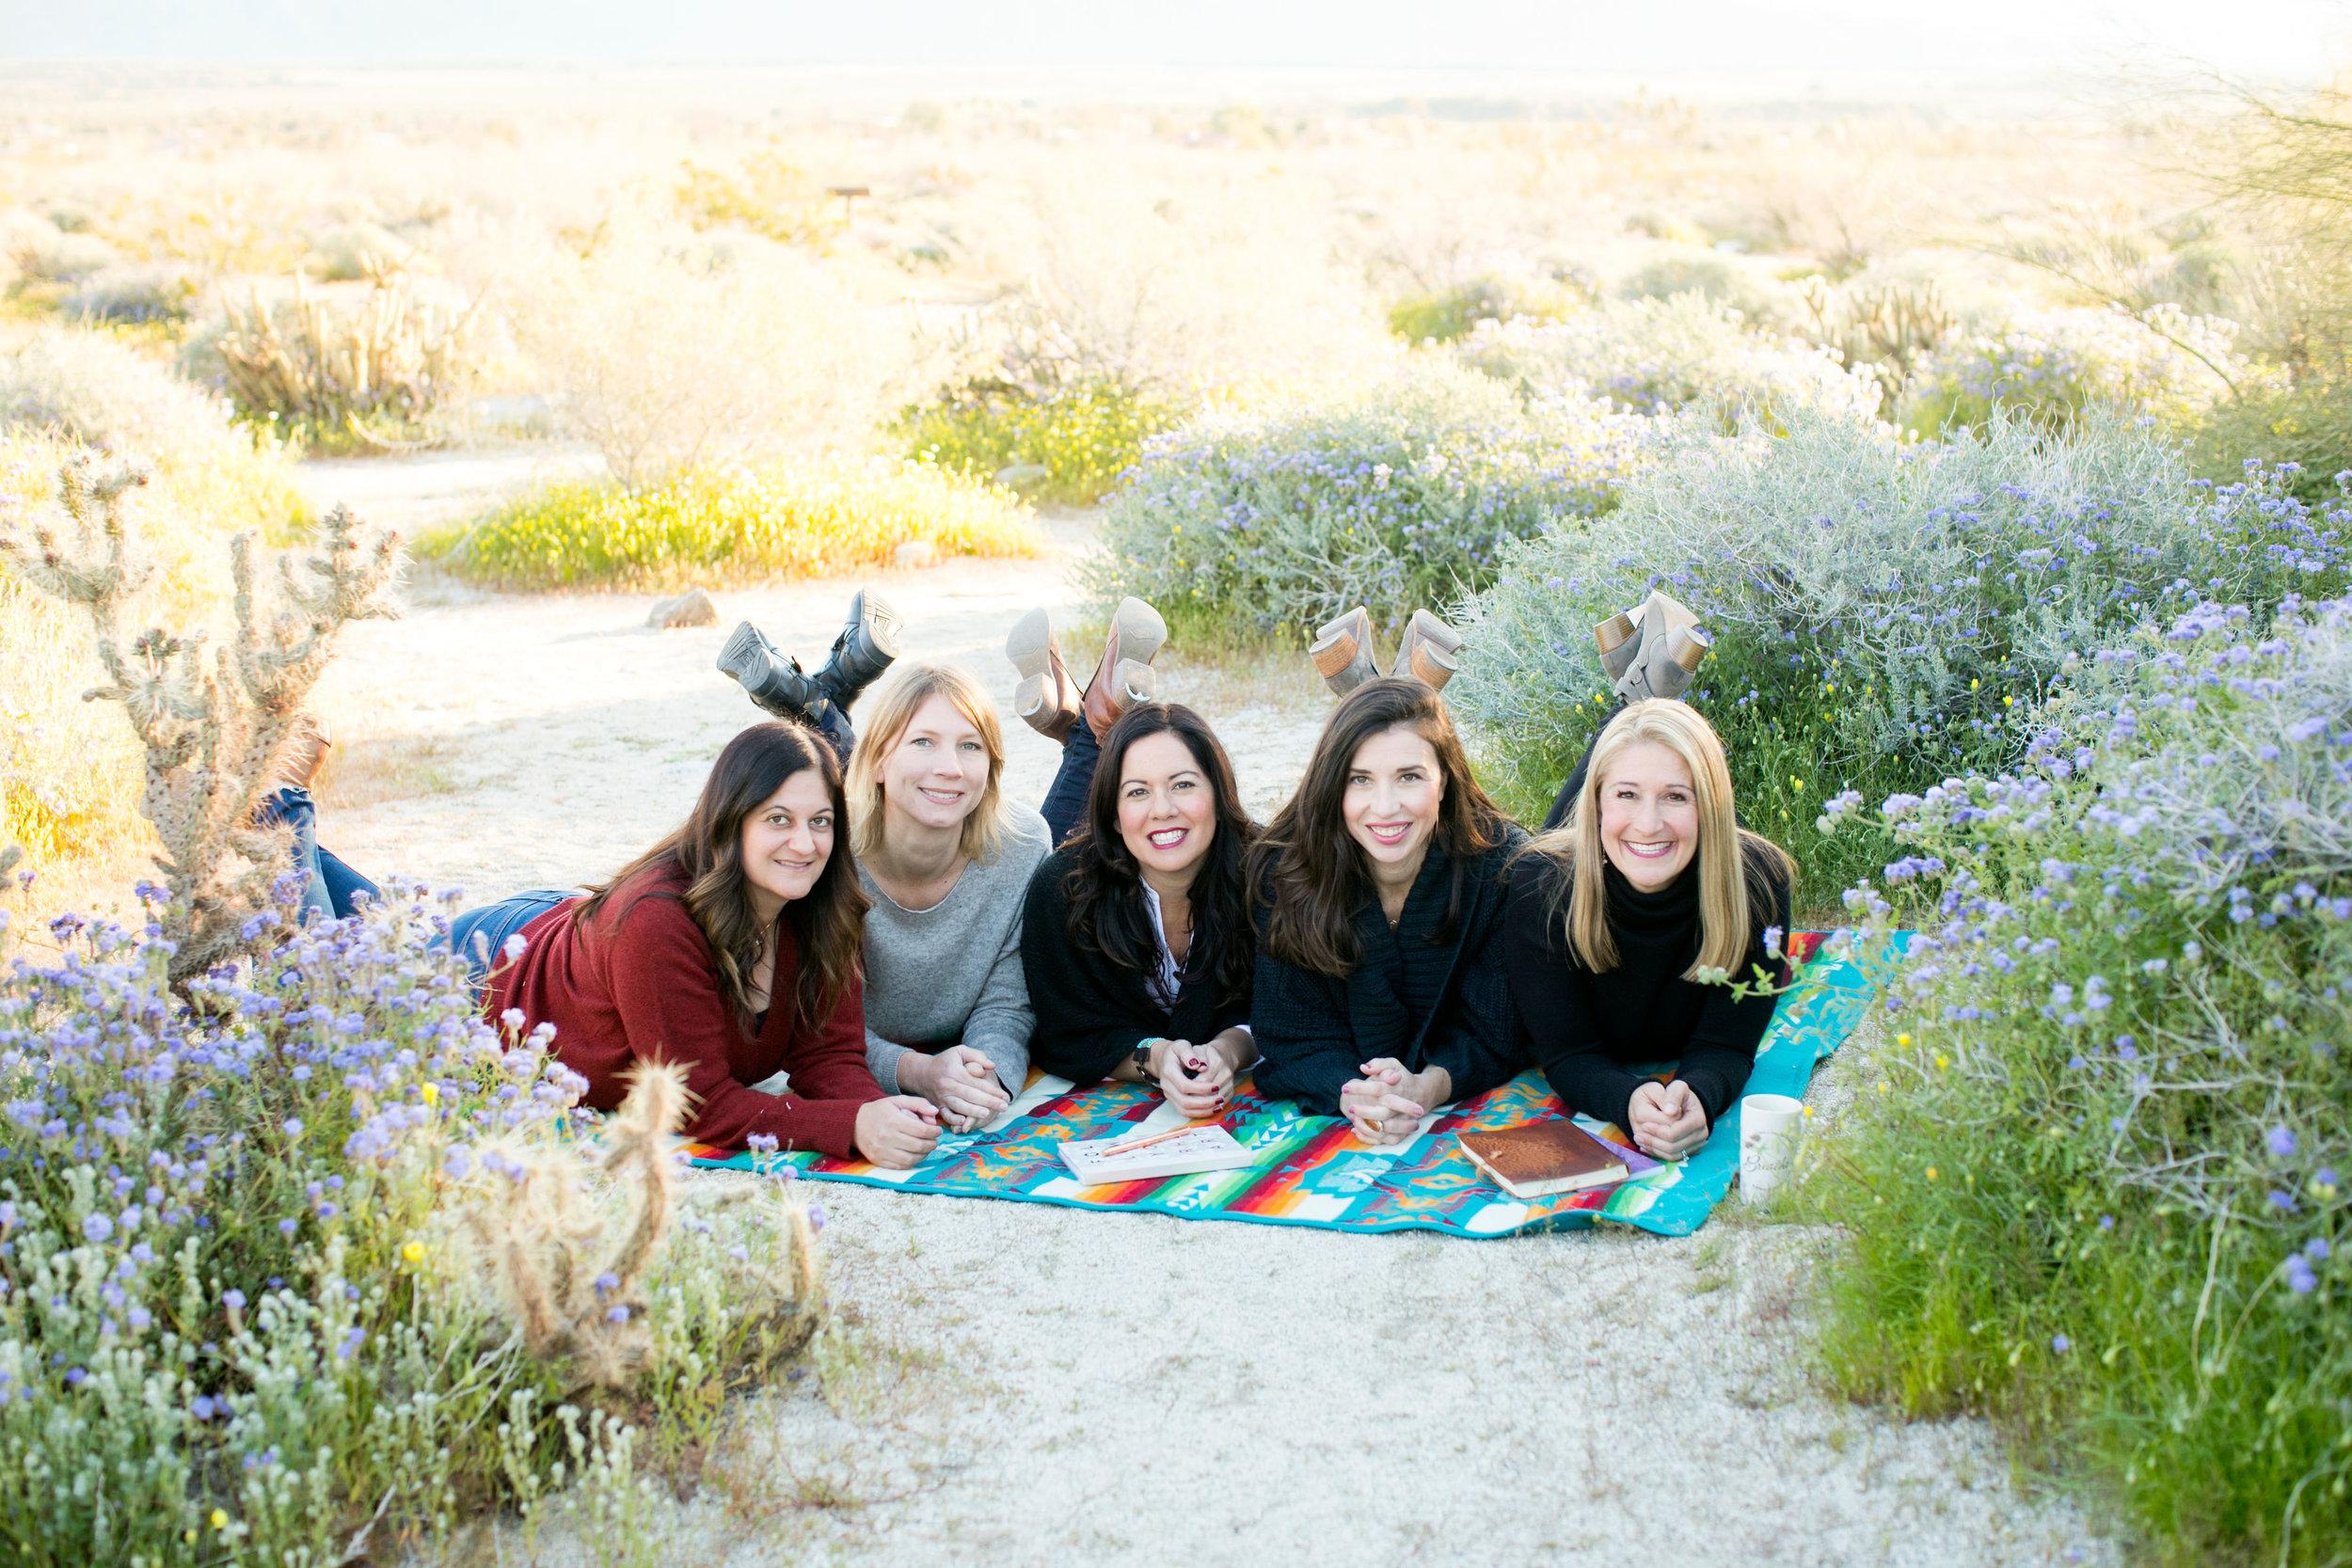 l-r: Nadia Mandilawi, Sarah Cox, Tiana Uribe, Christina Graff-Tovar, Cami Eiskamp